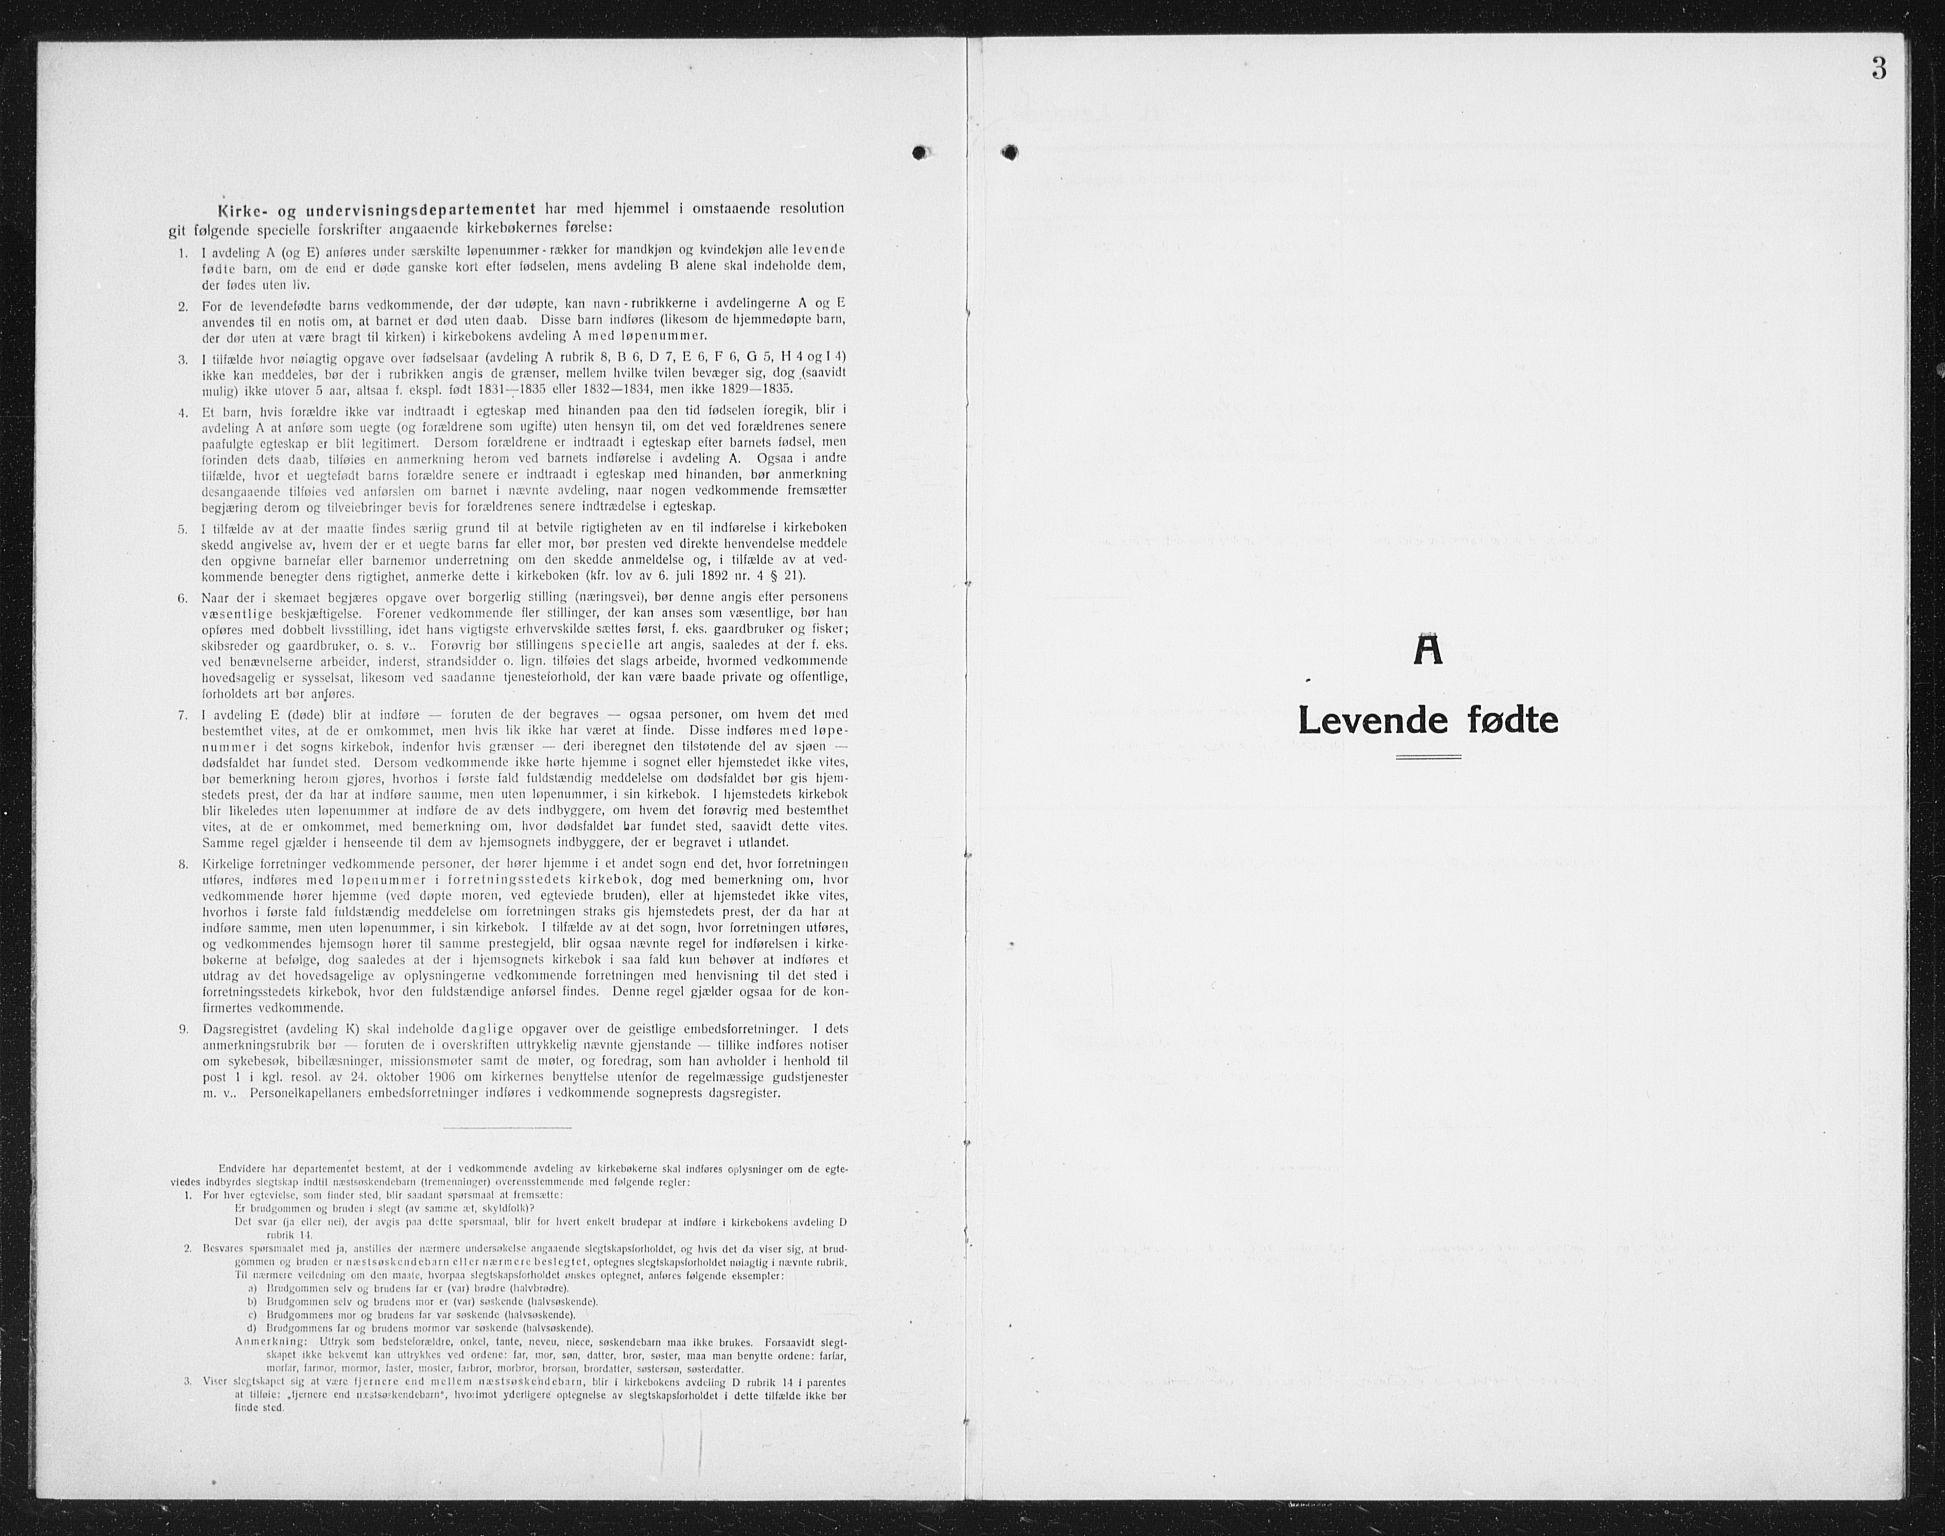 SAT, Ministerialprotokoller, klokkerbøker og fødselsregistre - Nordland, 887/L1229: Klokkerbok nr. 887C01, 1916-1935, s. 3